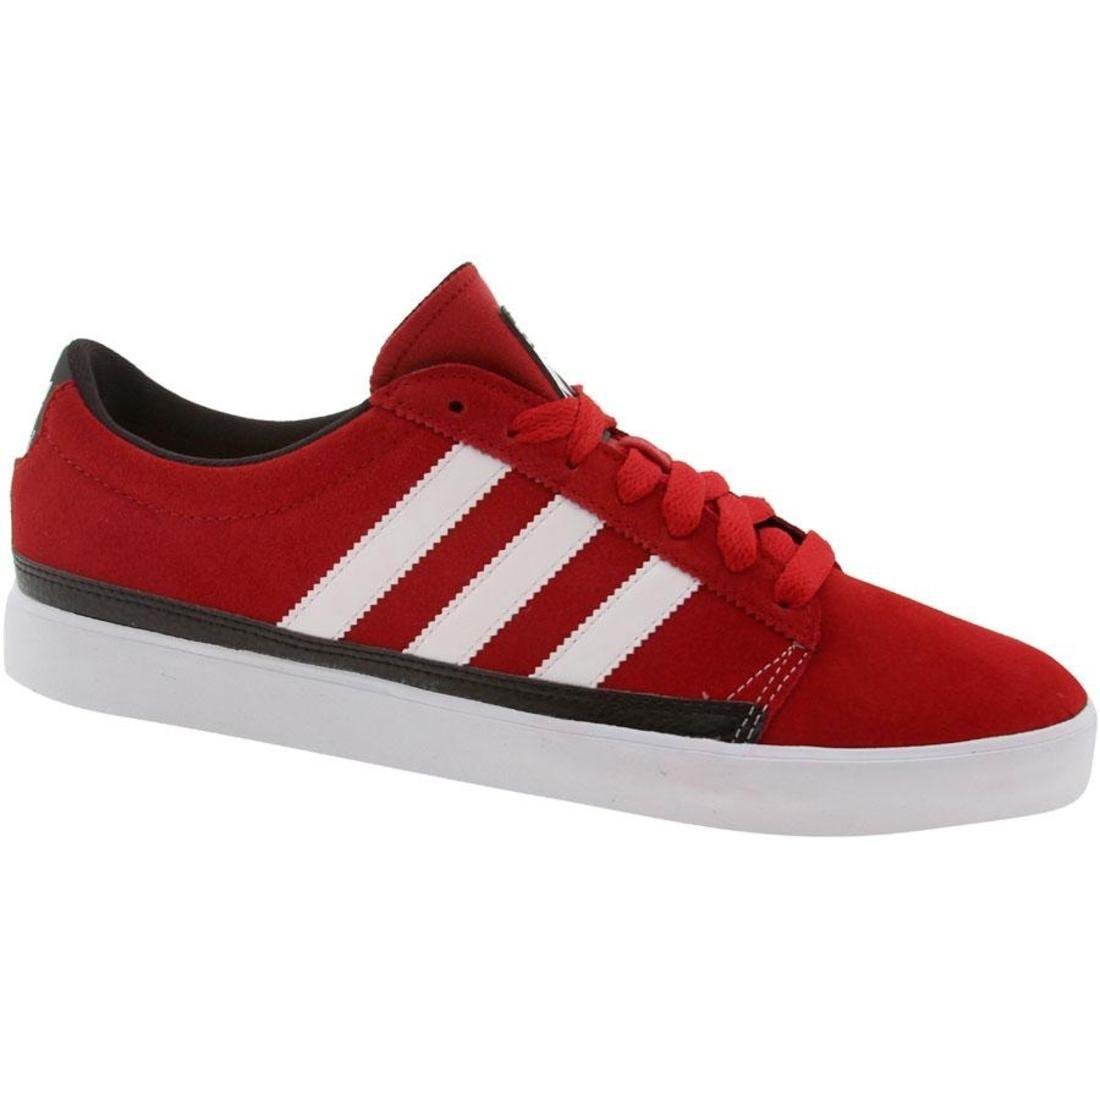 Adidas Skate Rayado Low (university red / runninwhite / black)